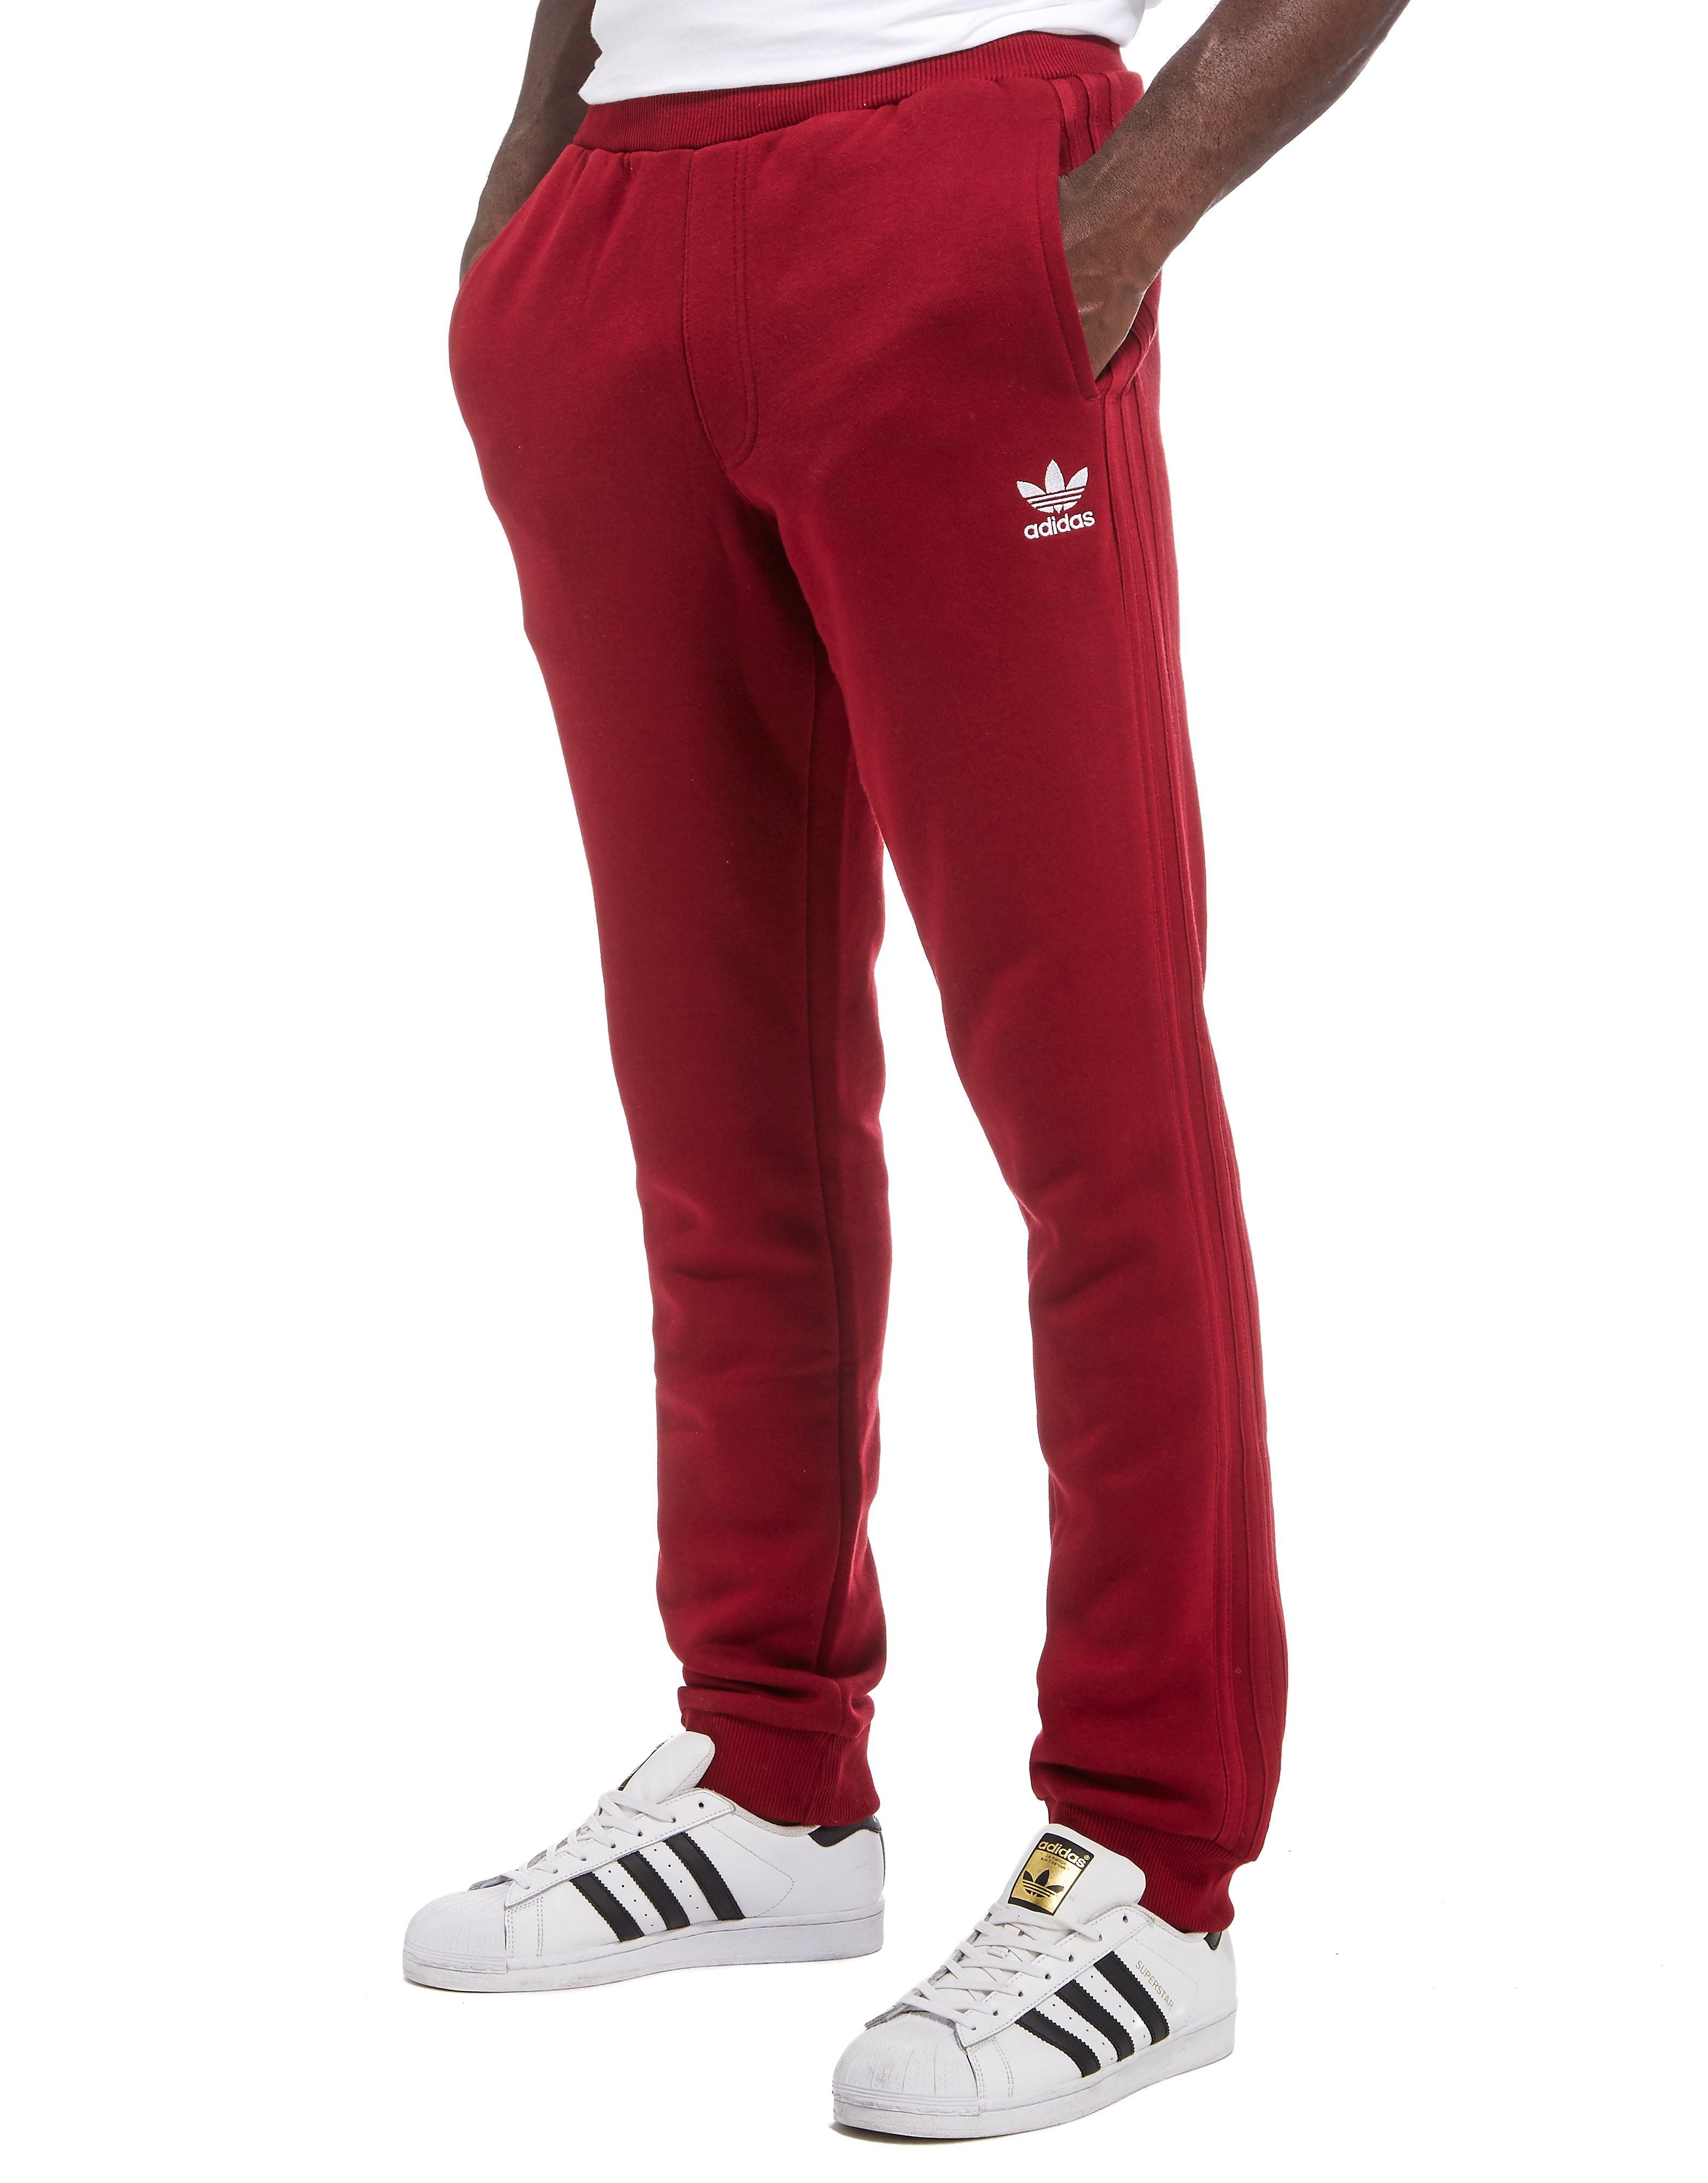 adidas Originals Trefoil Pantalon